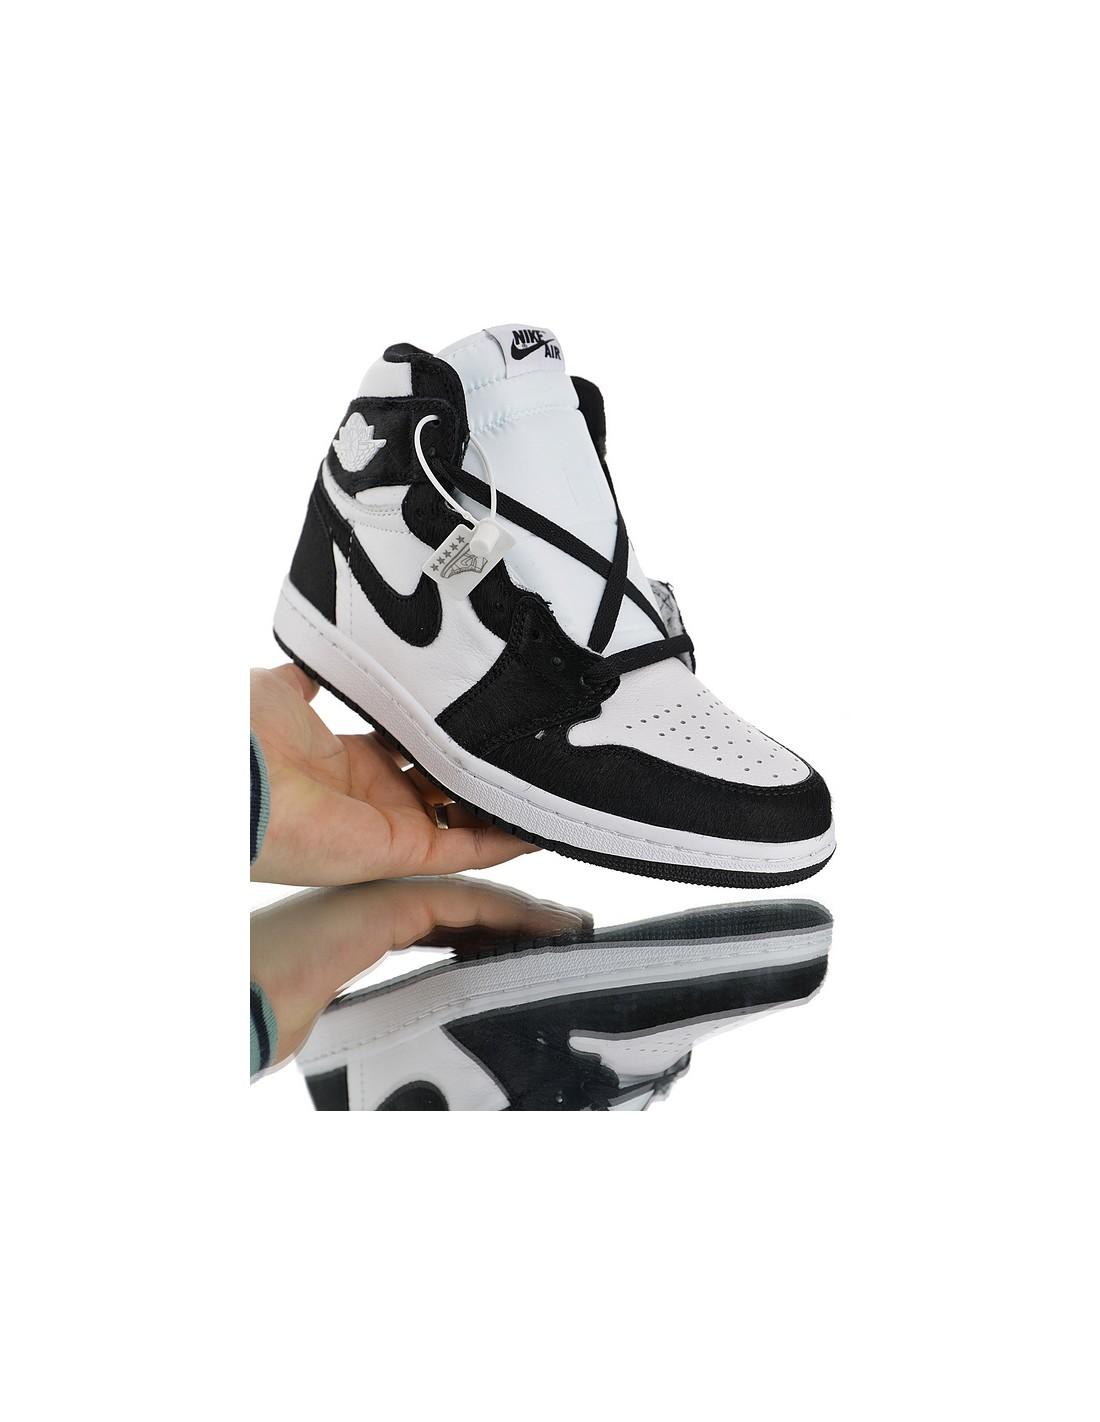 "online store 05ebe c3371 Home · Air Jordan 1 Retro High OG ""Panda"". Previous. Next. Previous"